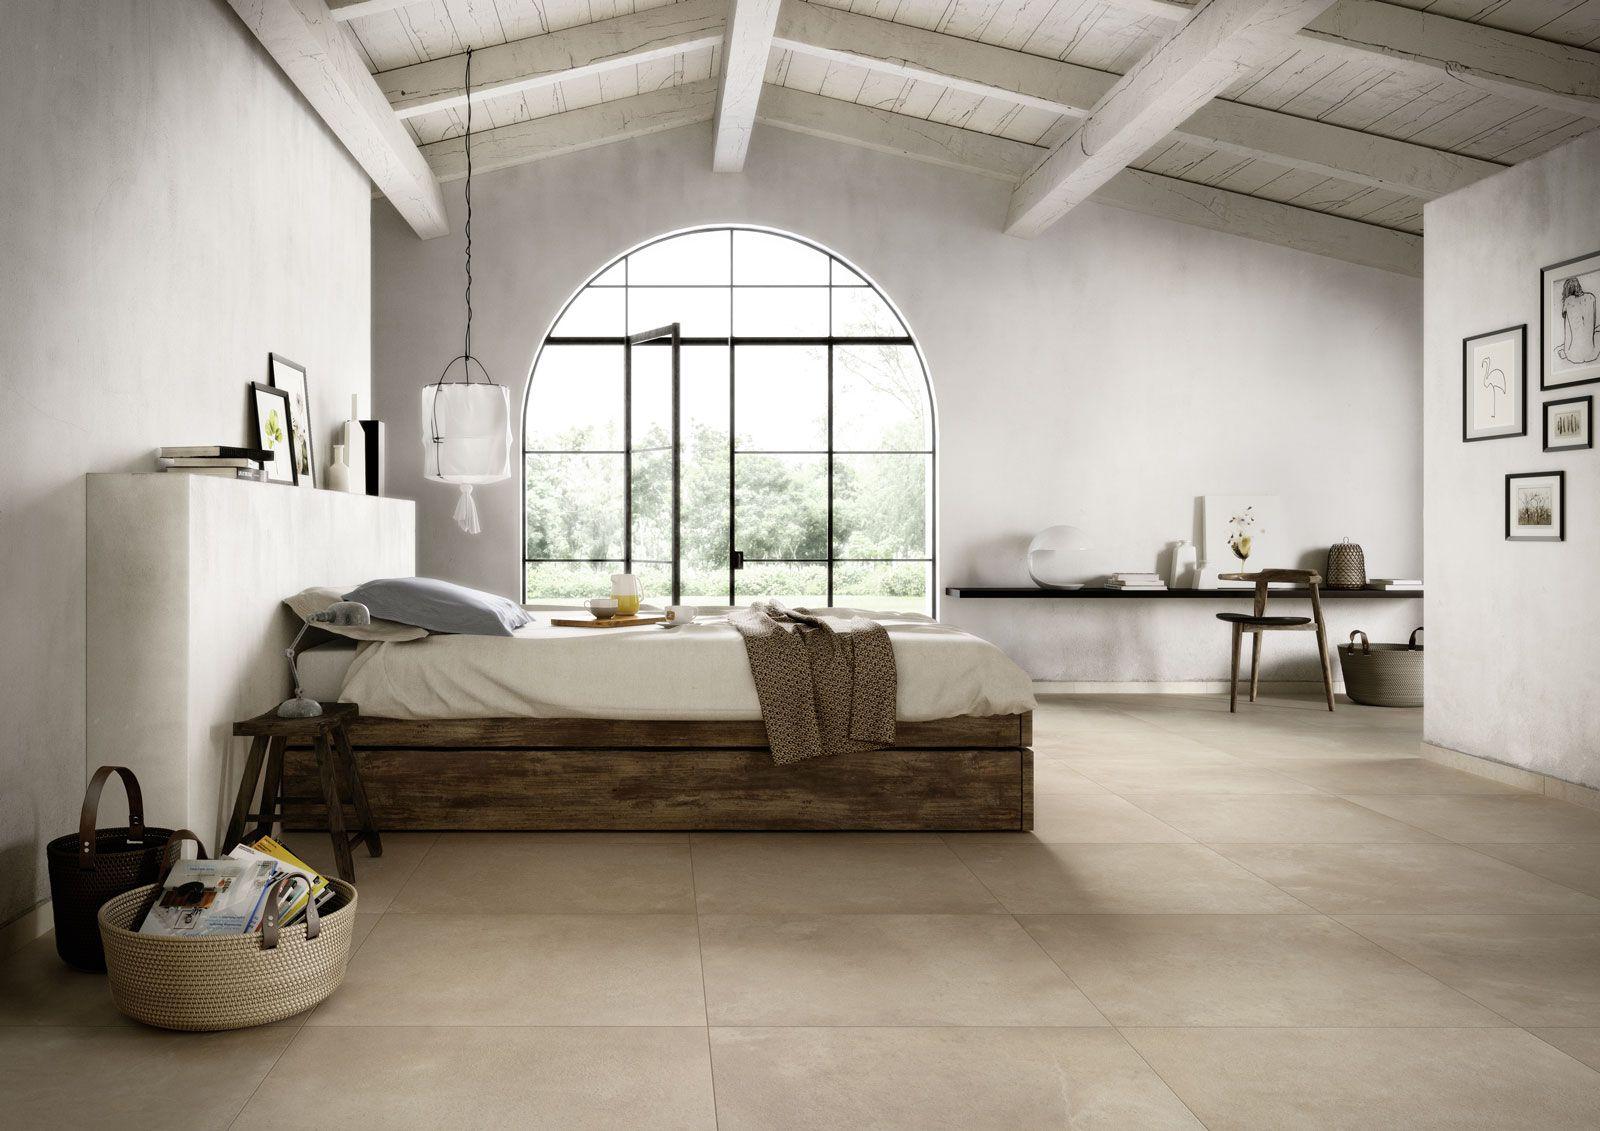 Timeless piastrelle in ceramica marazzi 7231 l o f t pinterest